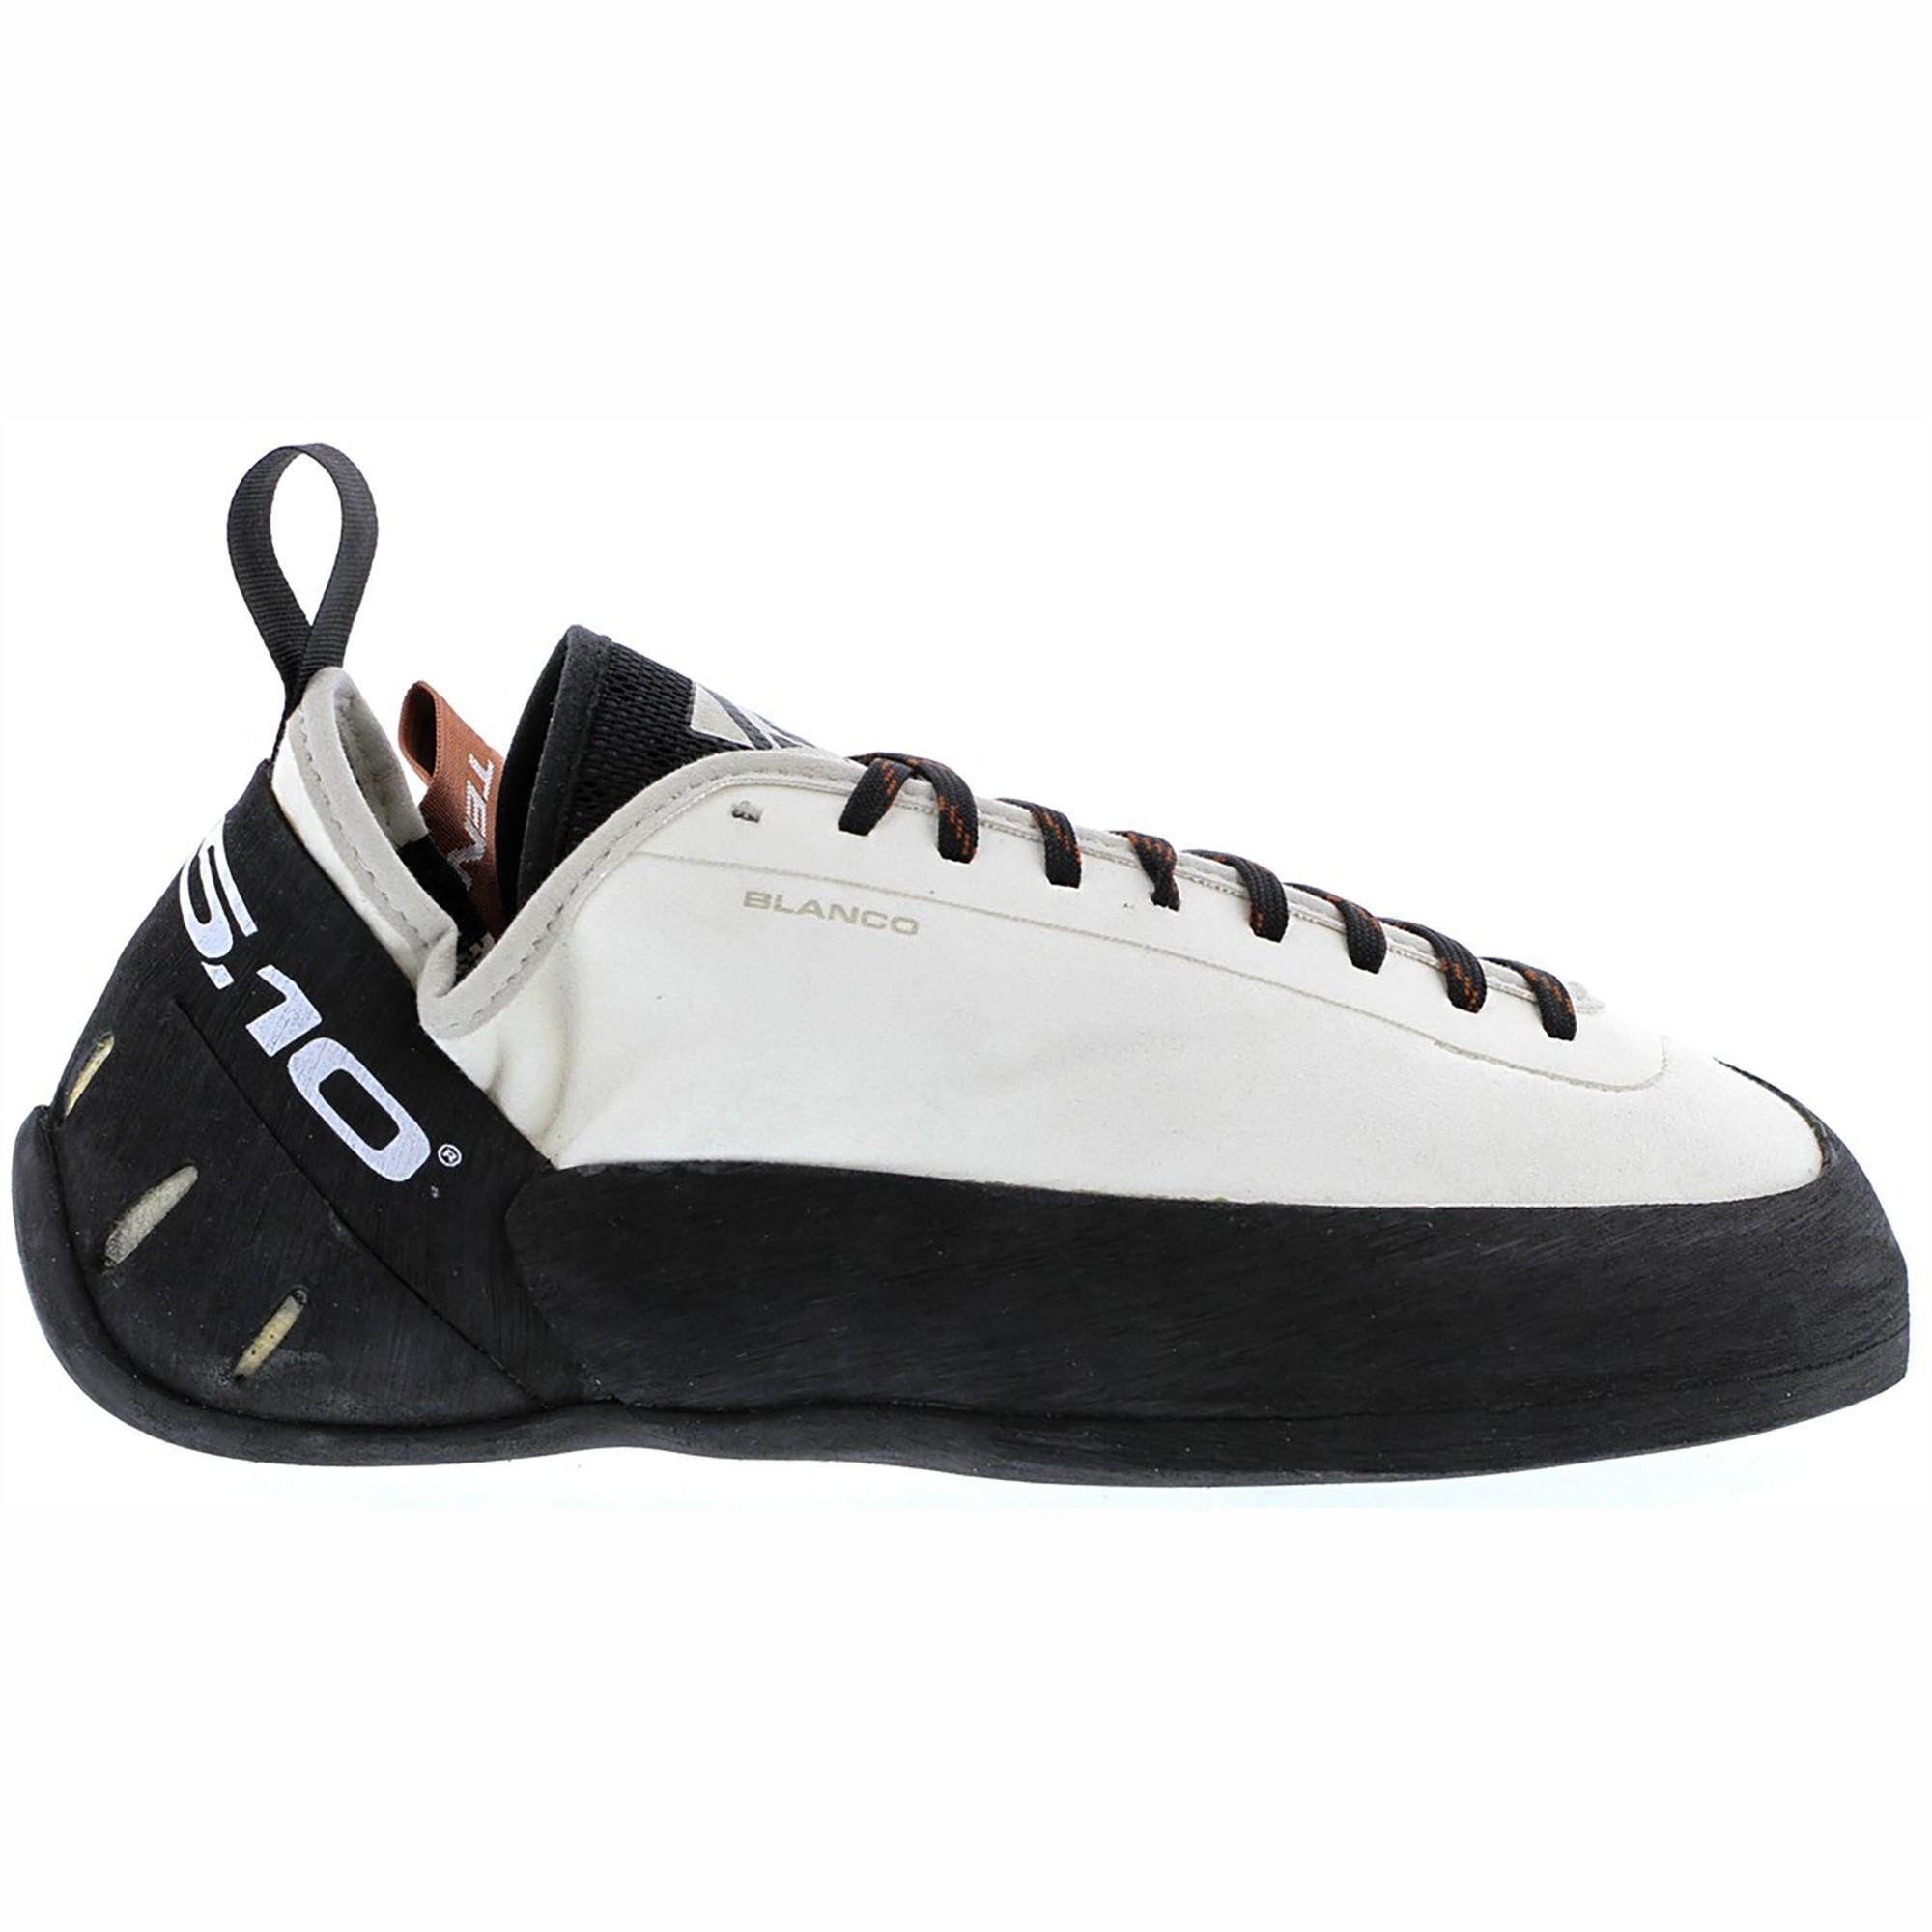 Five.Ten Anasazi Blanco Climbing Shoe - Chalk White -4